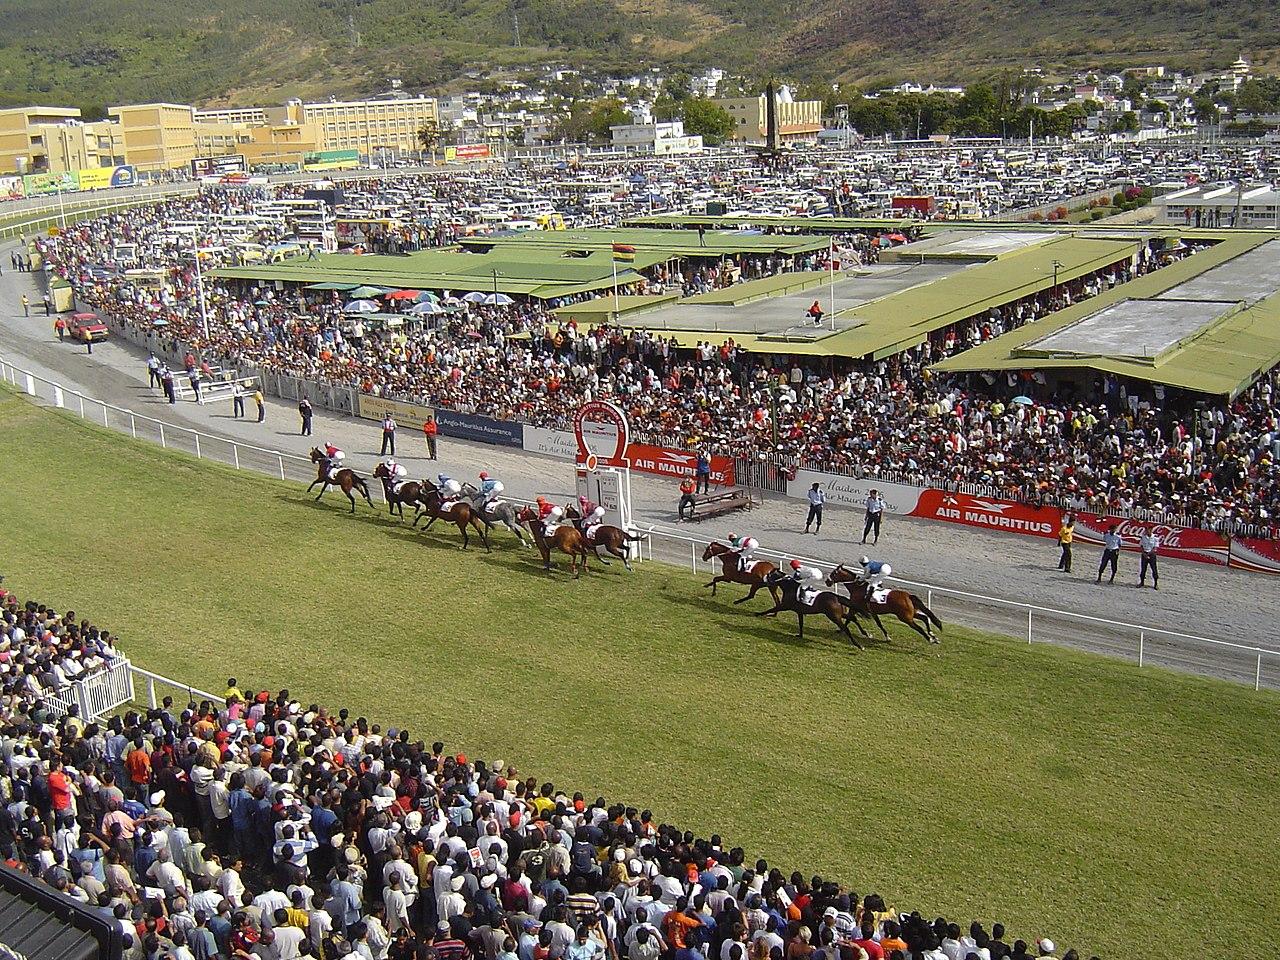 Champ de Mars Racecourse - Things to Do in Mauritius